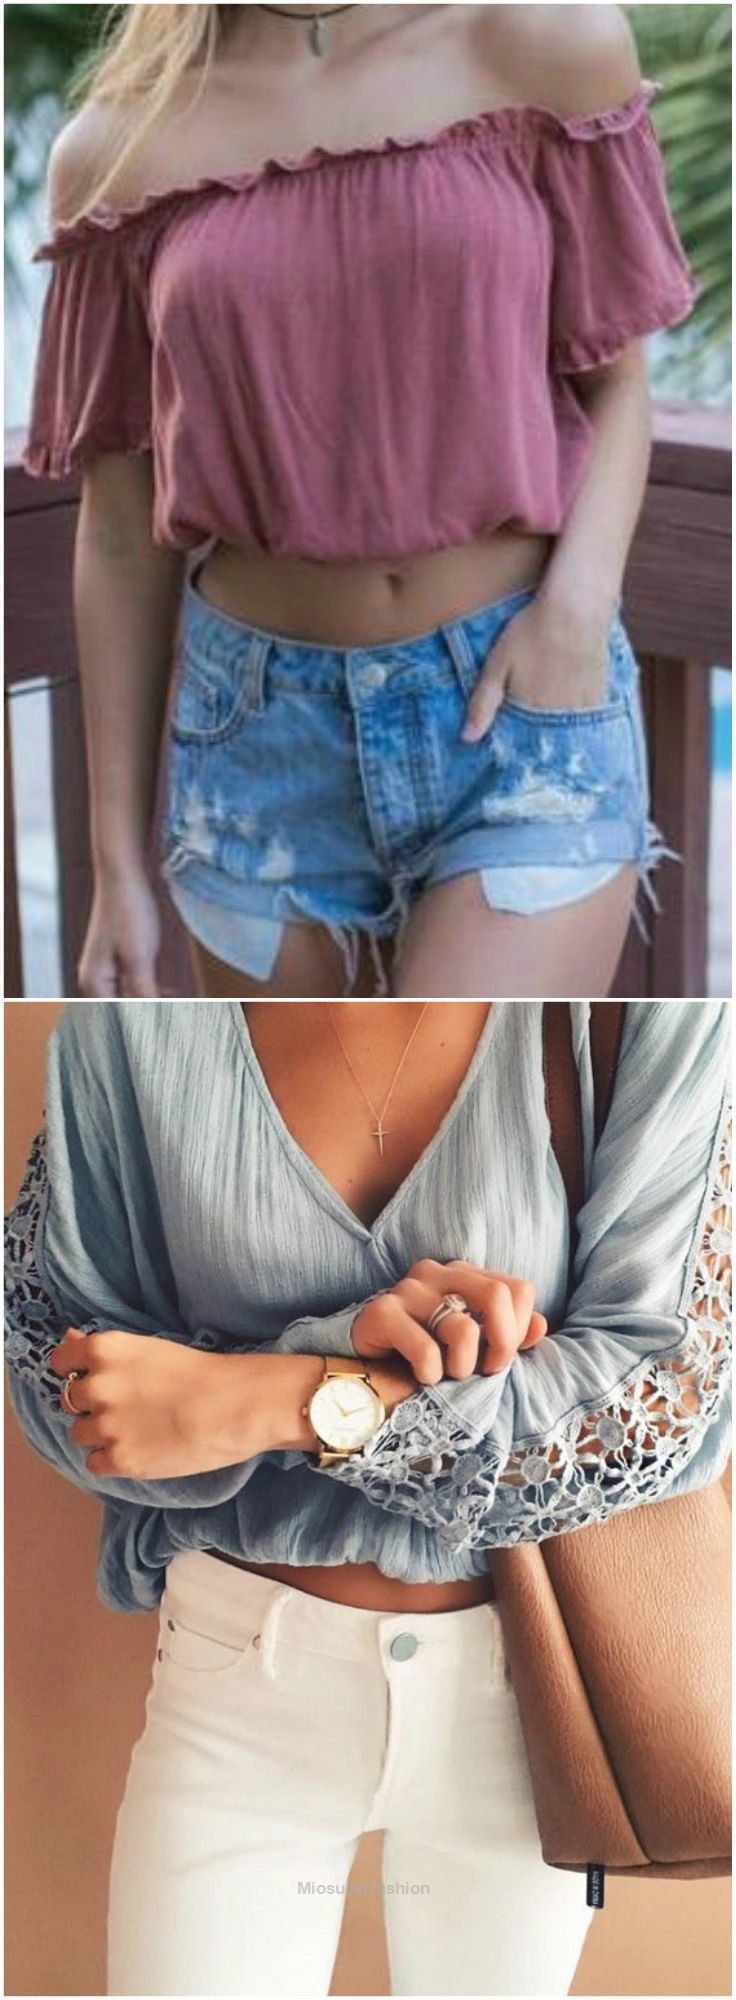 Best 25 Teen Girl Bedrooms Ideas On Pinterest: Best 25+ Teenage Outfits Ideas On Pinterest